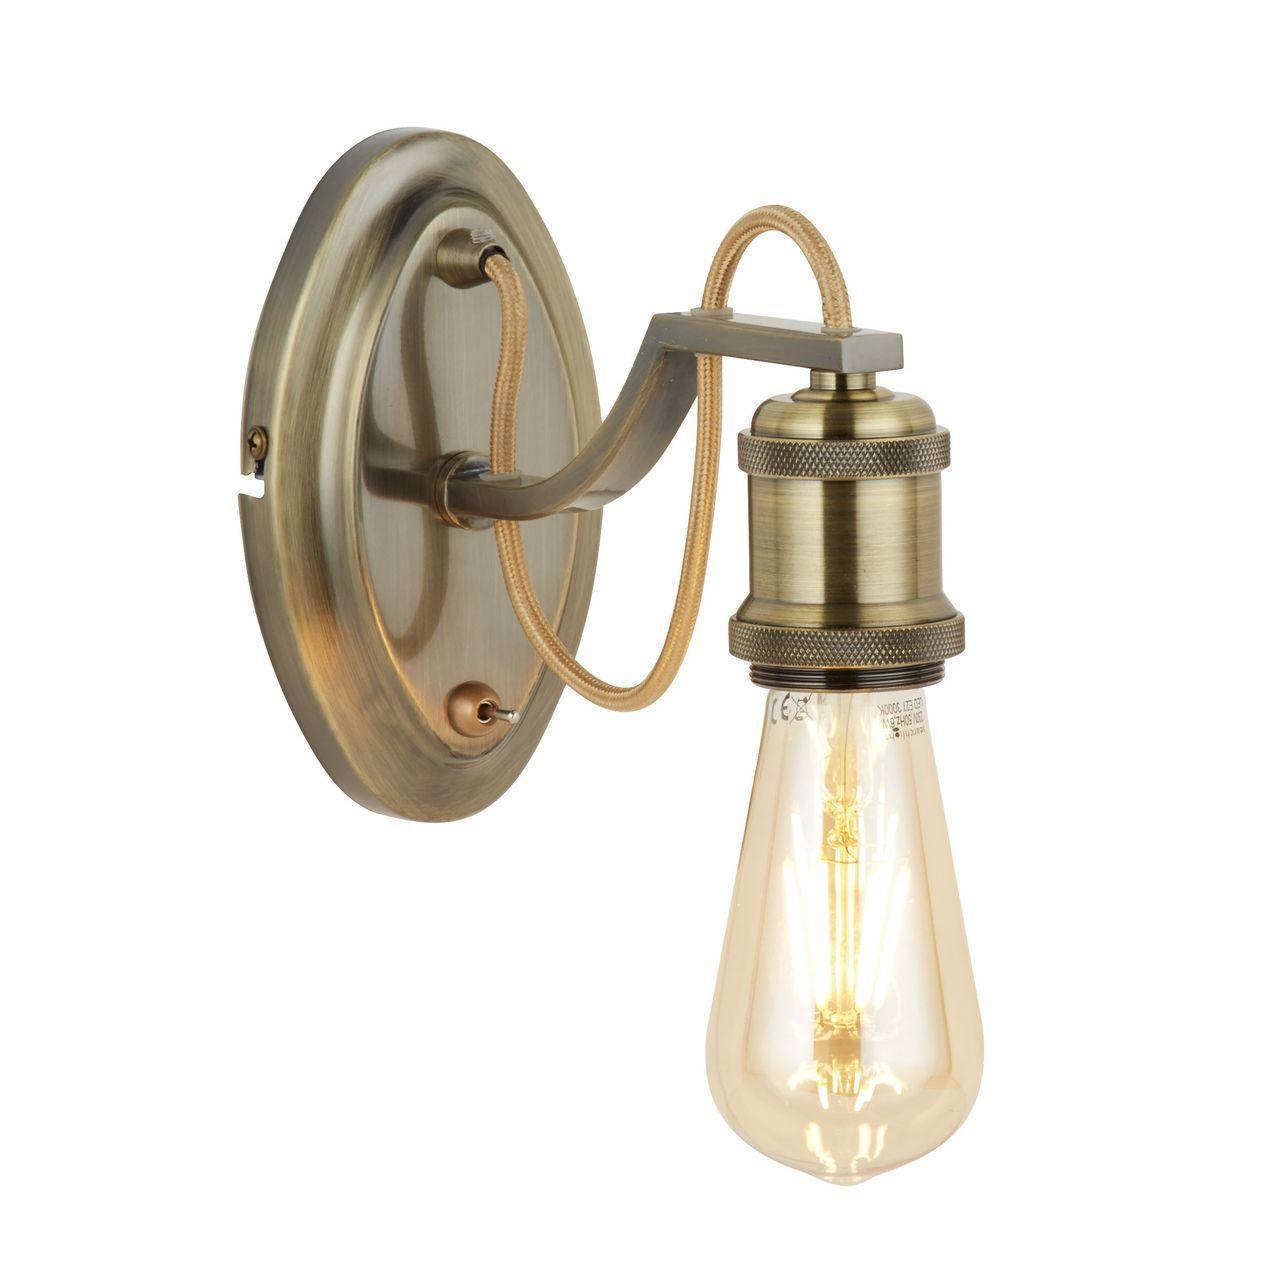 Бра Arte Lamp Inedito A2985AP-1AB бра arte lamp inedito a2985ap 1ab